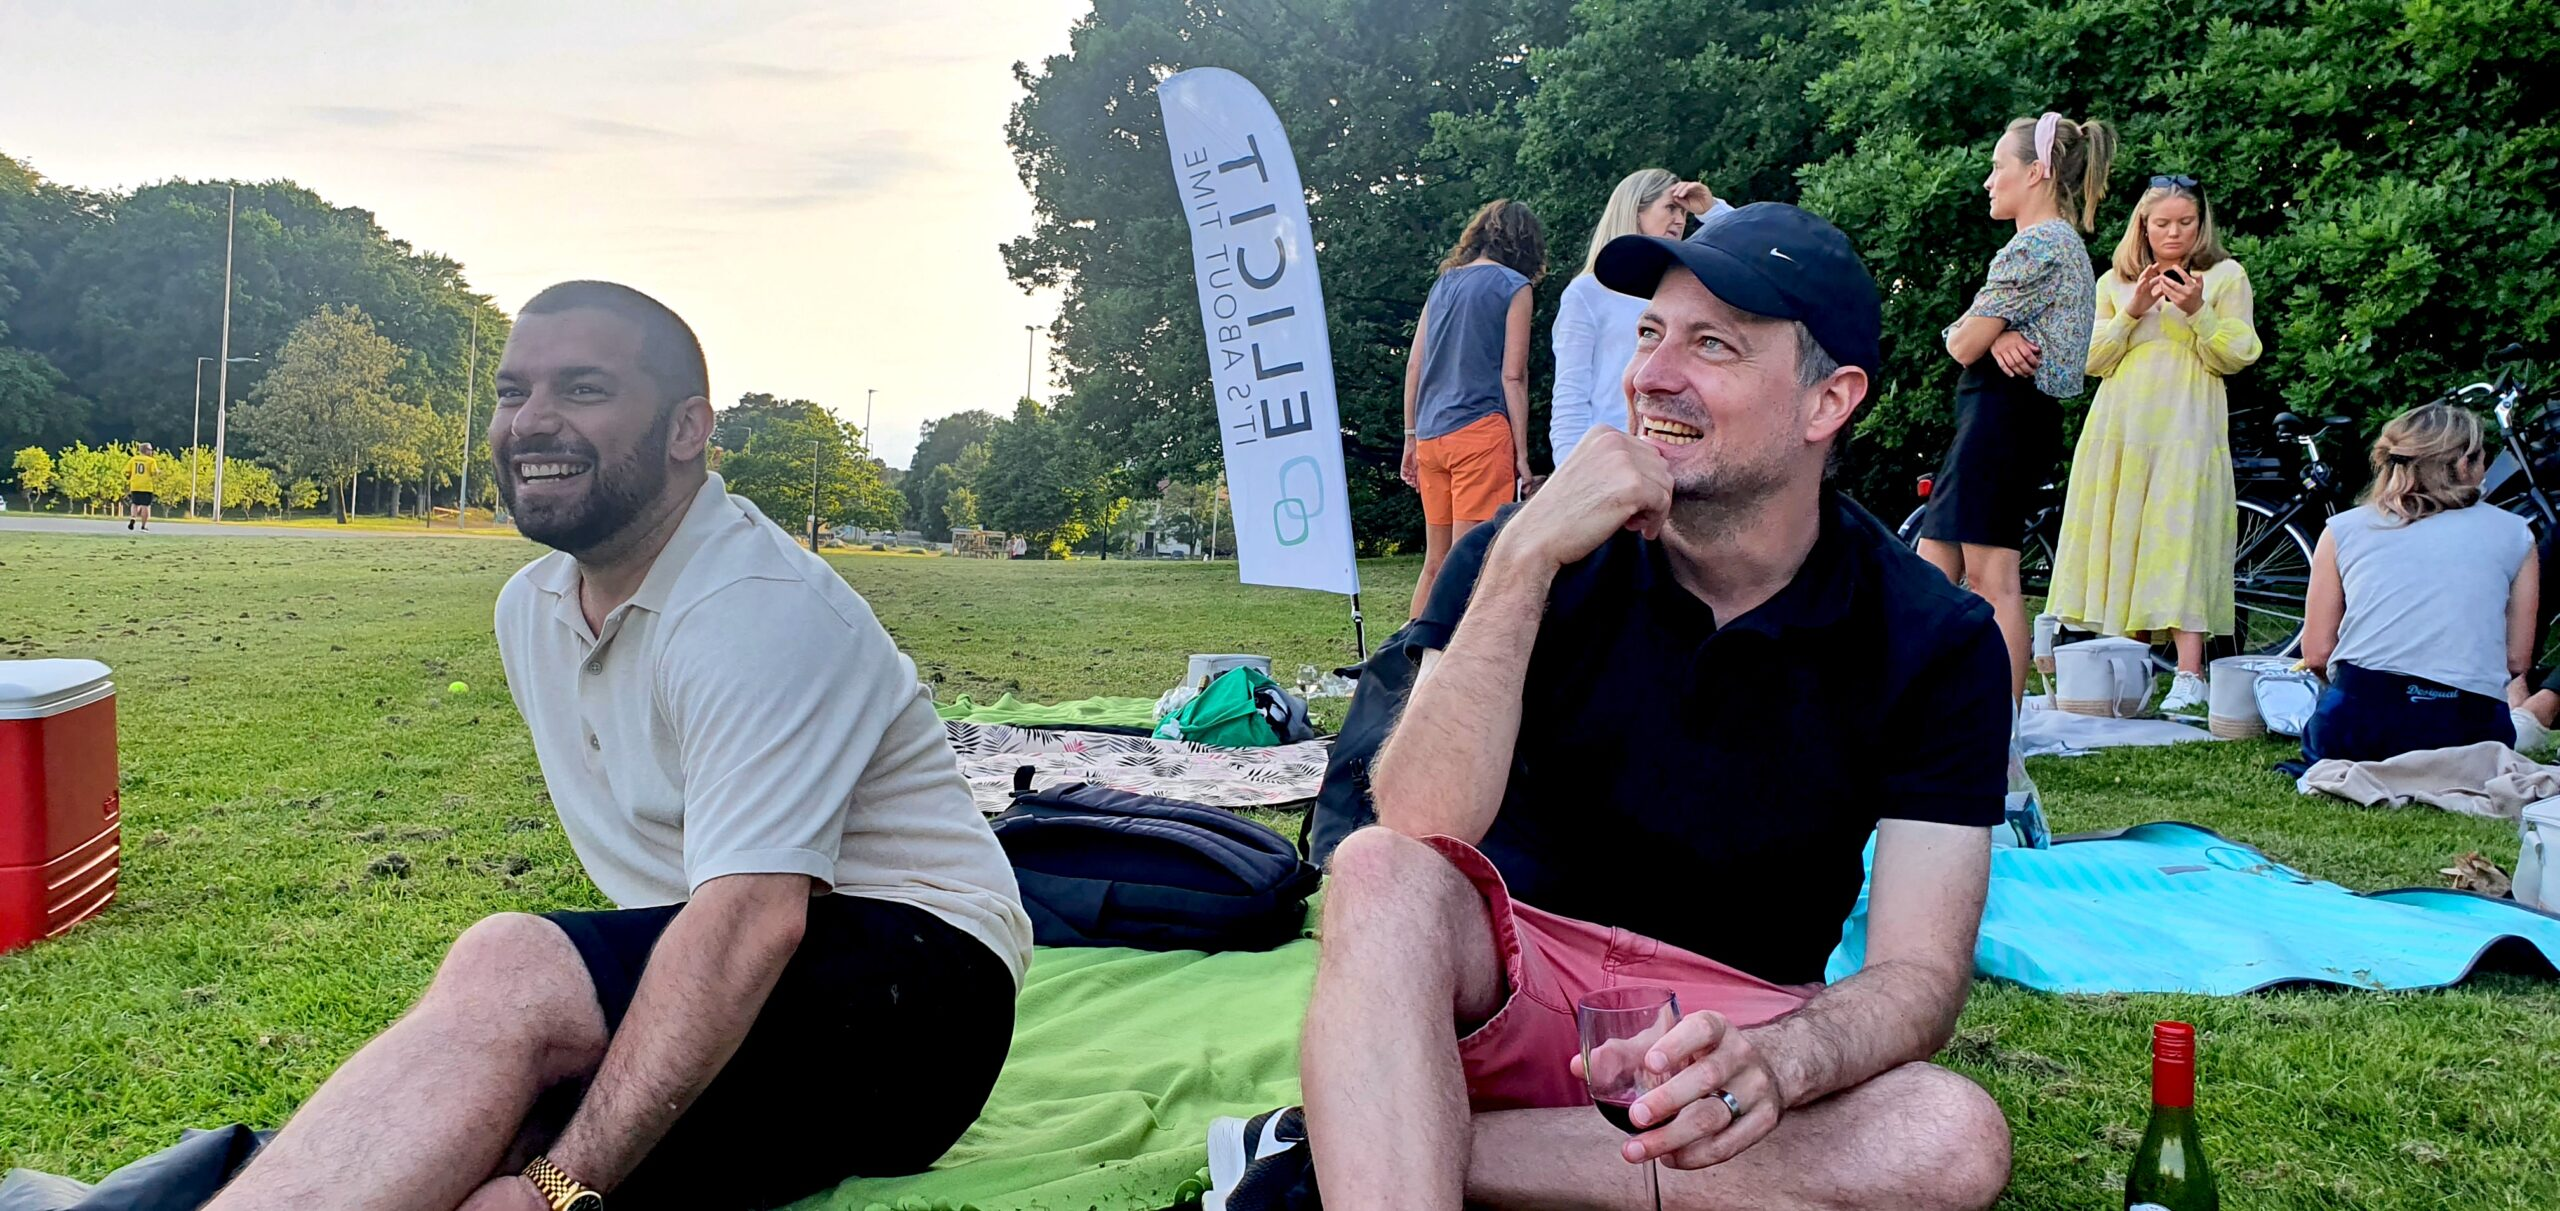 sommarfest hos Elicit